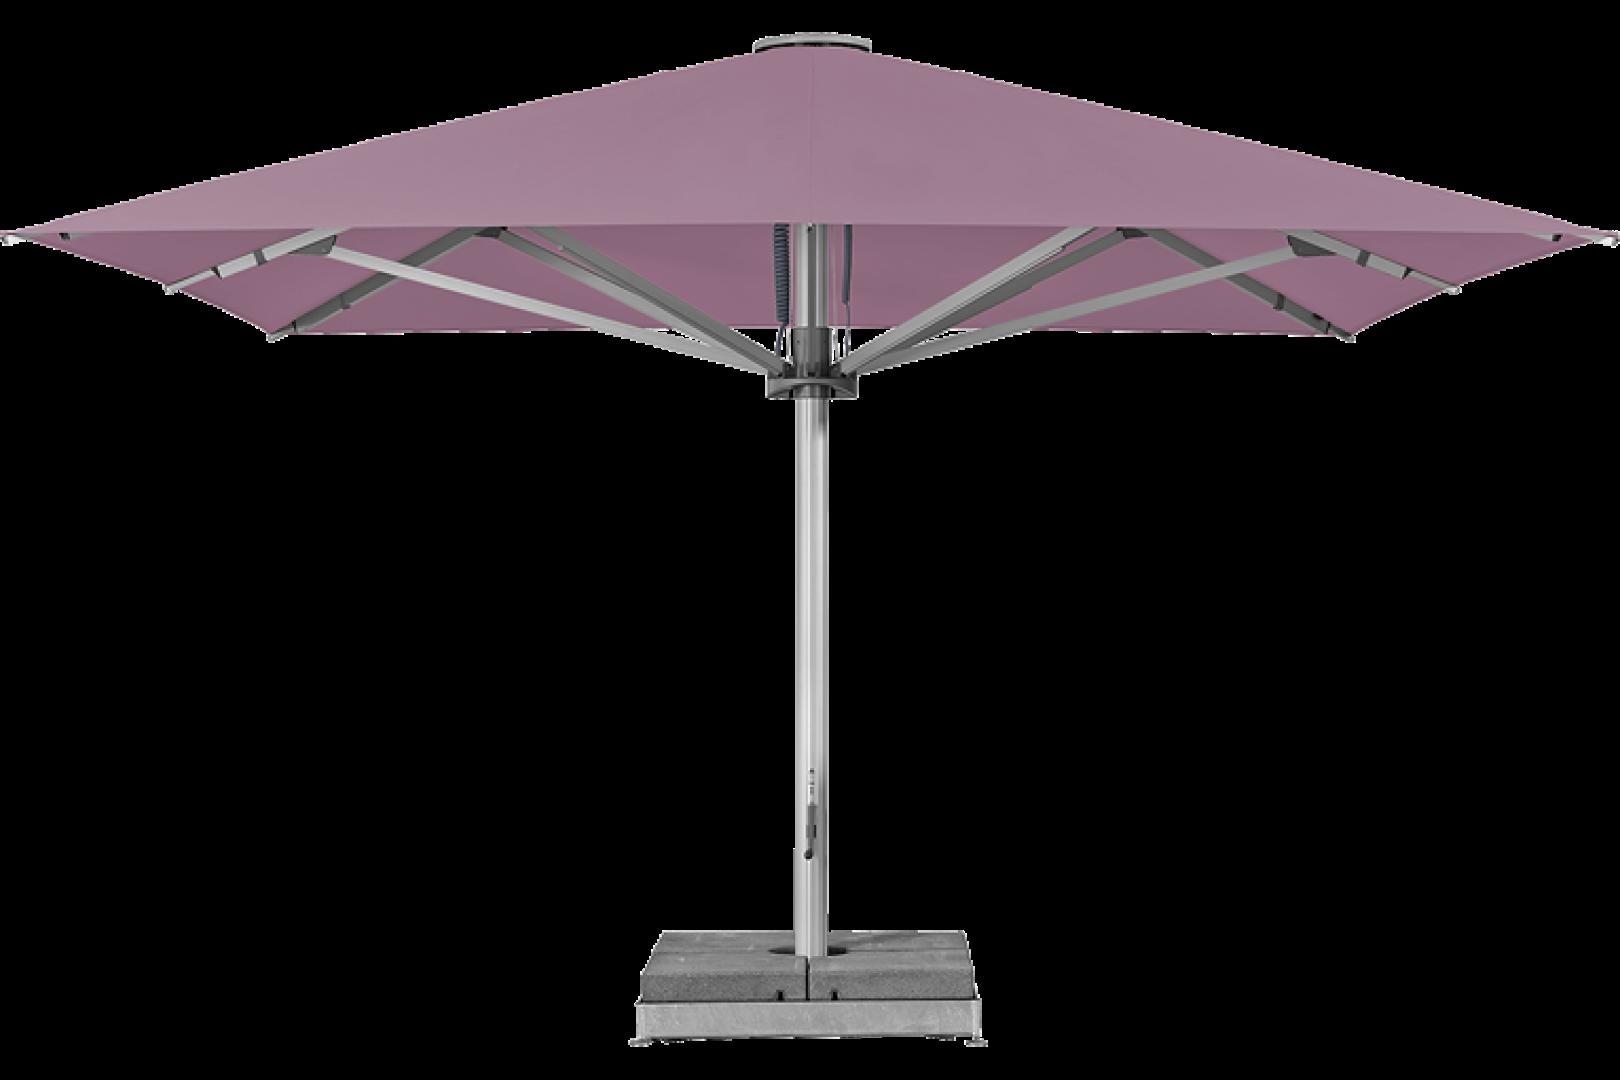 Palazzo Style Giant Market Umbrella